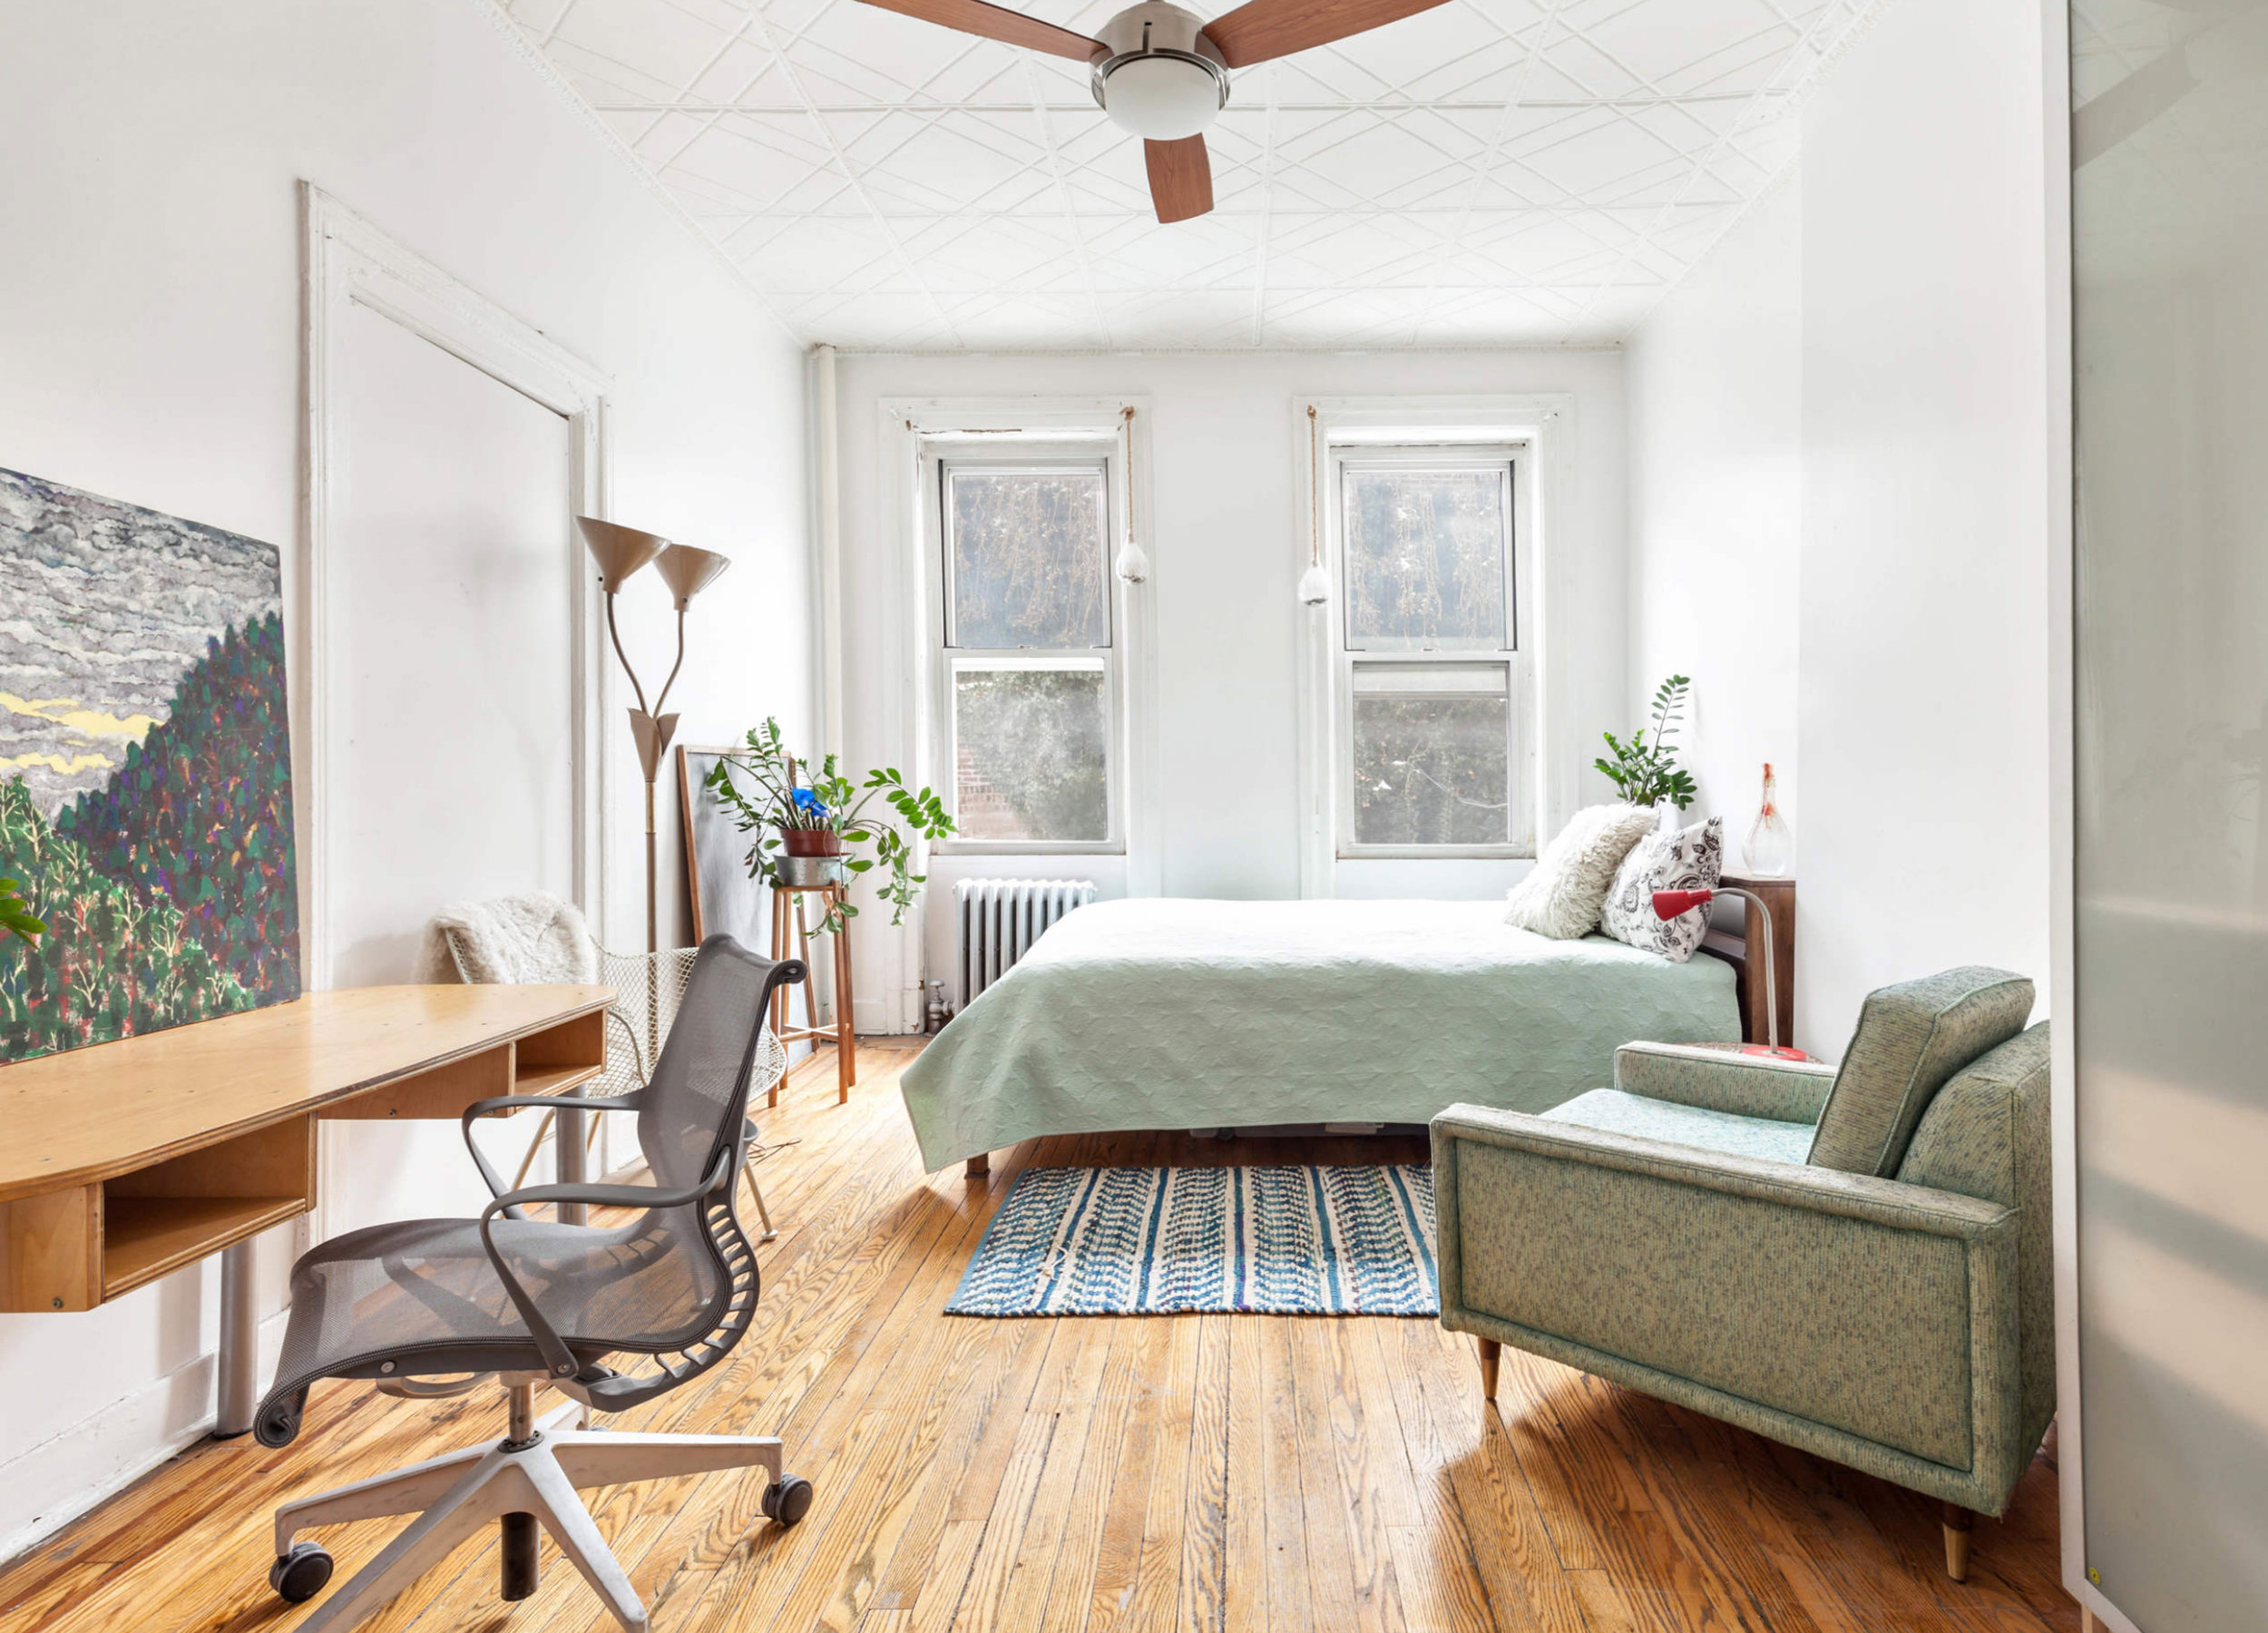 617 Vanderbilt Ave   , Unit 3  Prospect Heights, Brooklyn   $899,000  2 Beds | 1 Baths | 1,035 SF